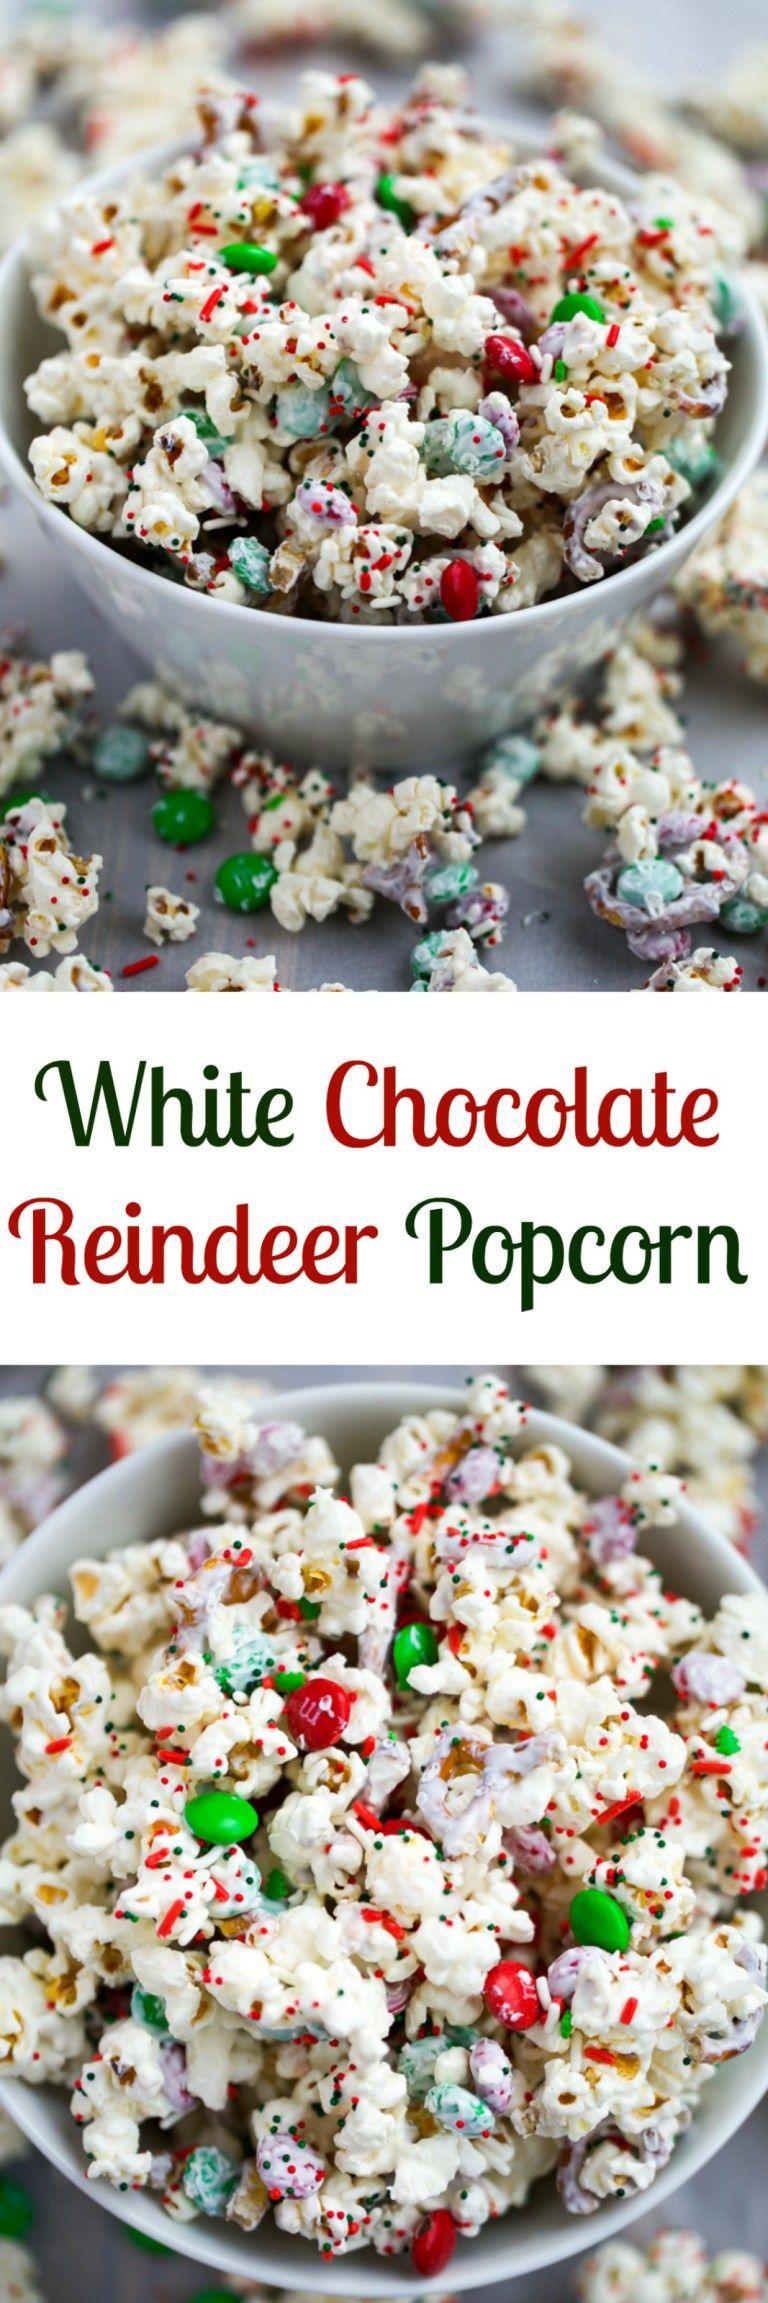 White Chocolate Reindeer Popcorn #holidaydesserts